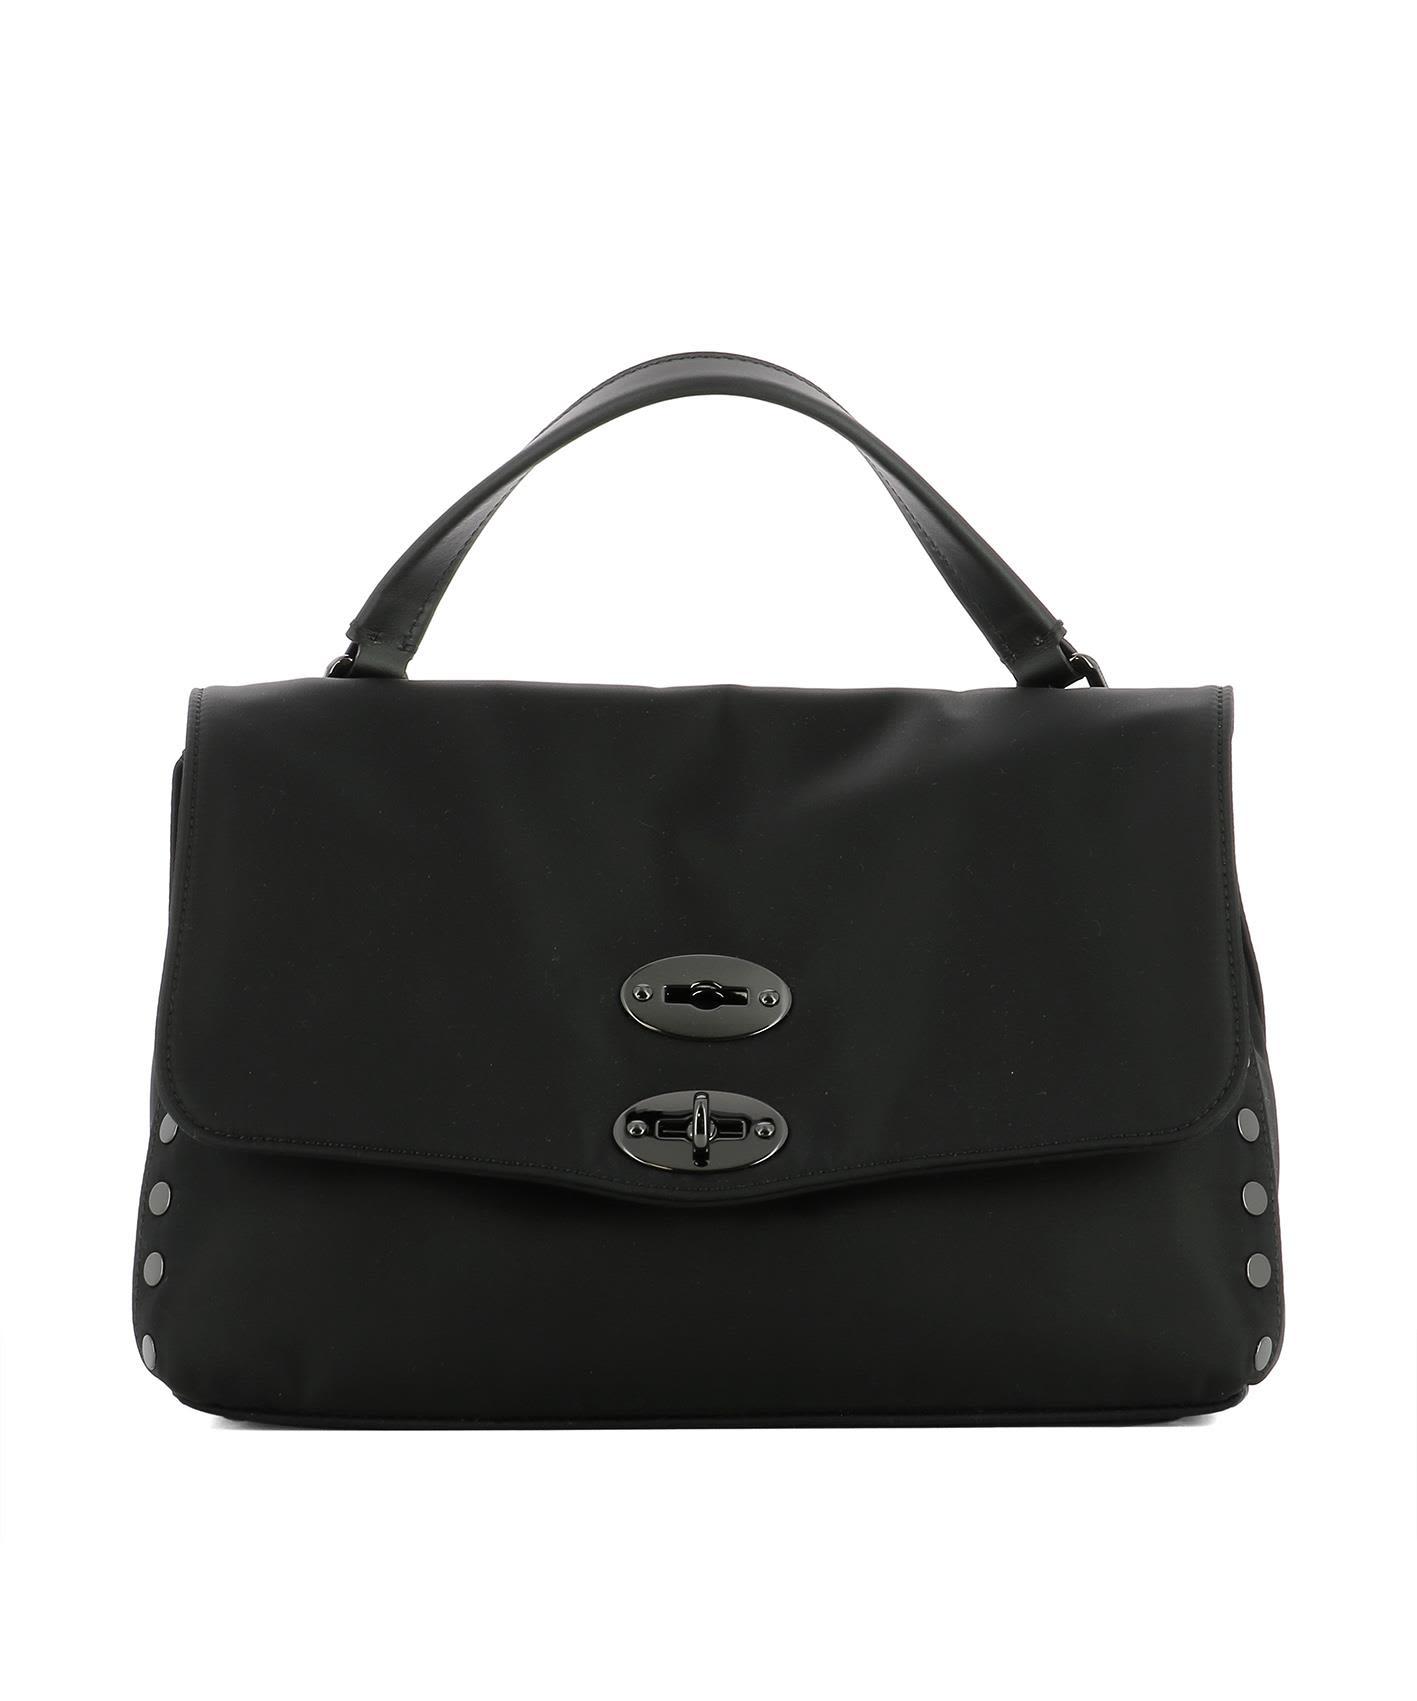 Top Handle Handbag On Sale, Postina M, Black, Leather, 2017, one size Zanellato